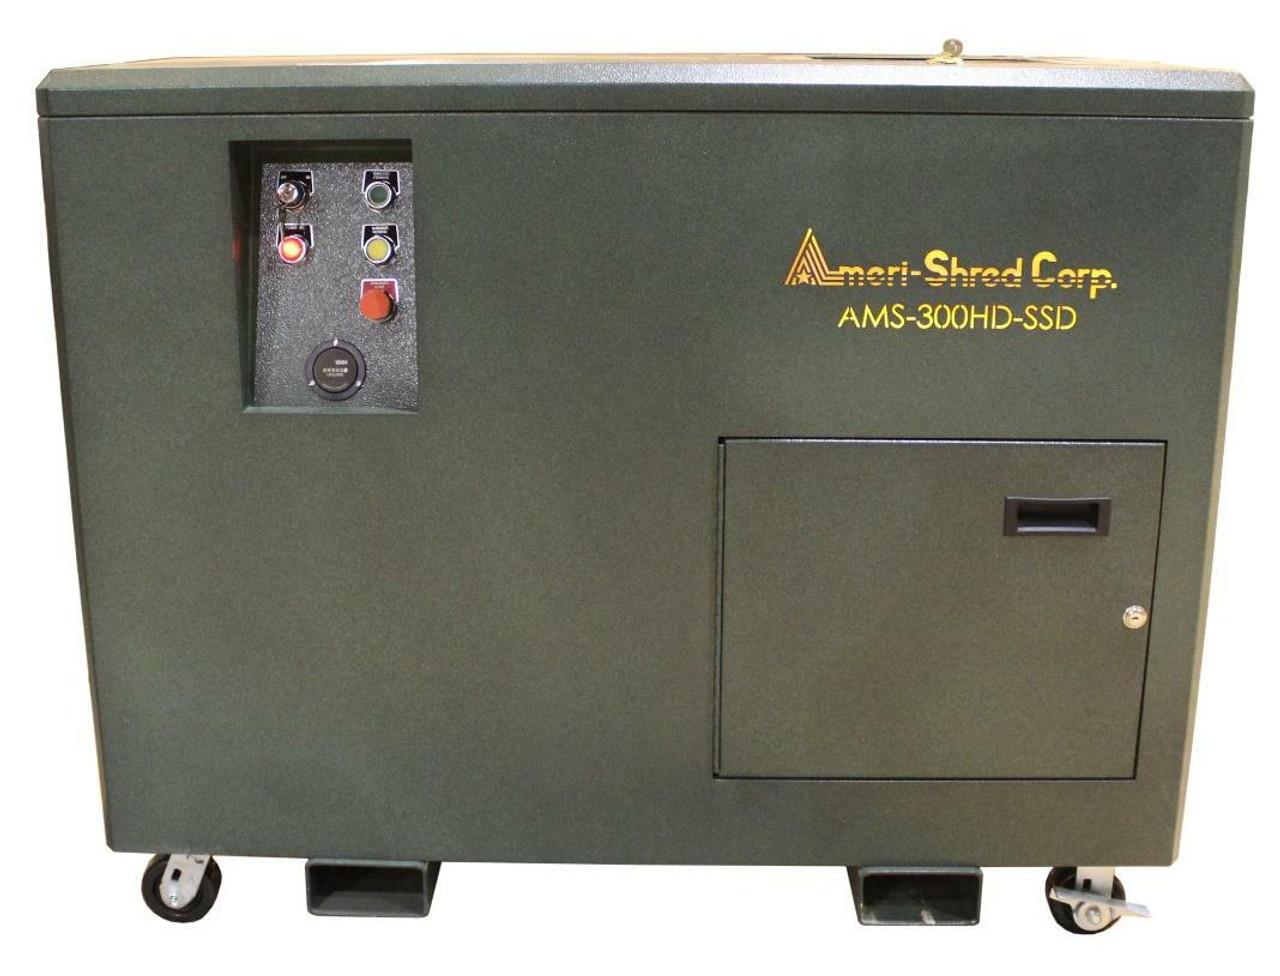 AMS-300HD-SSD